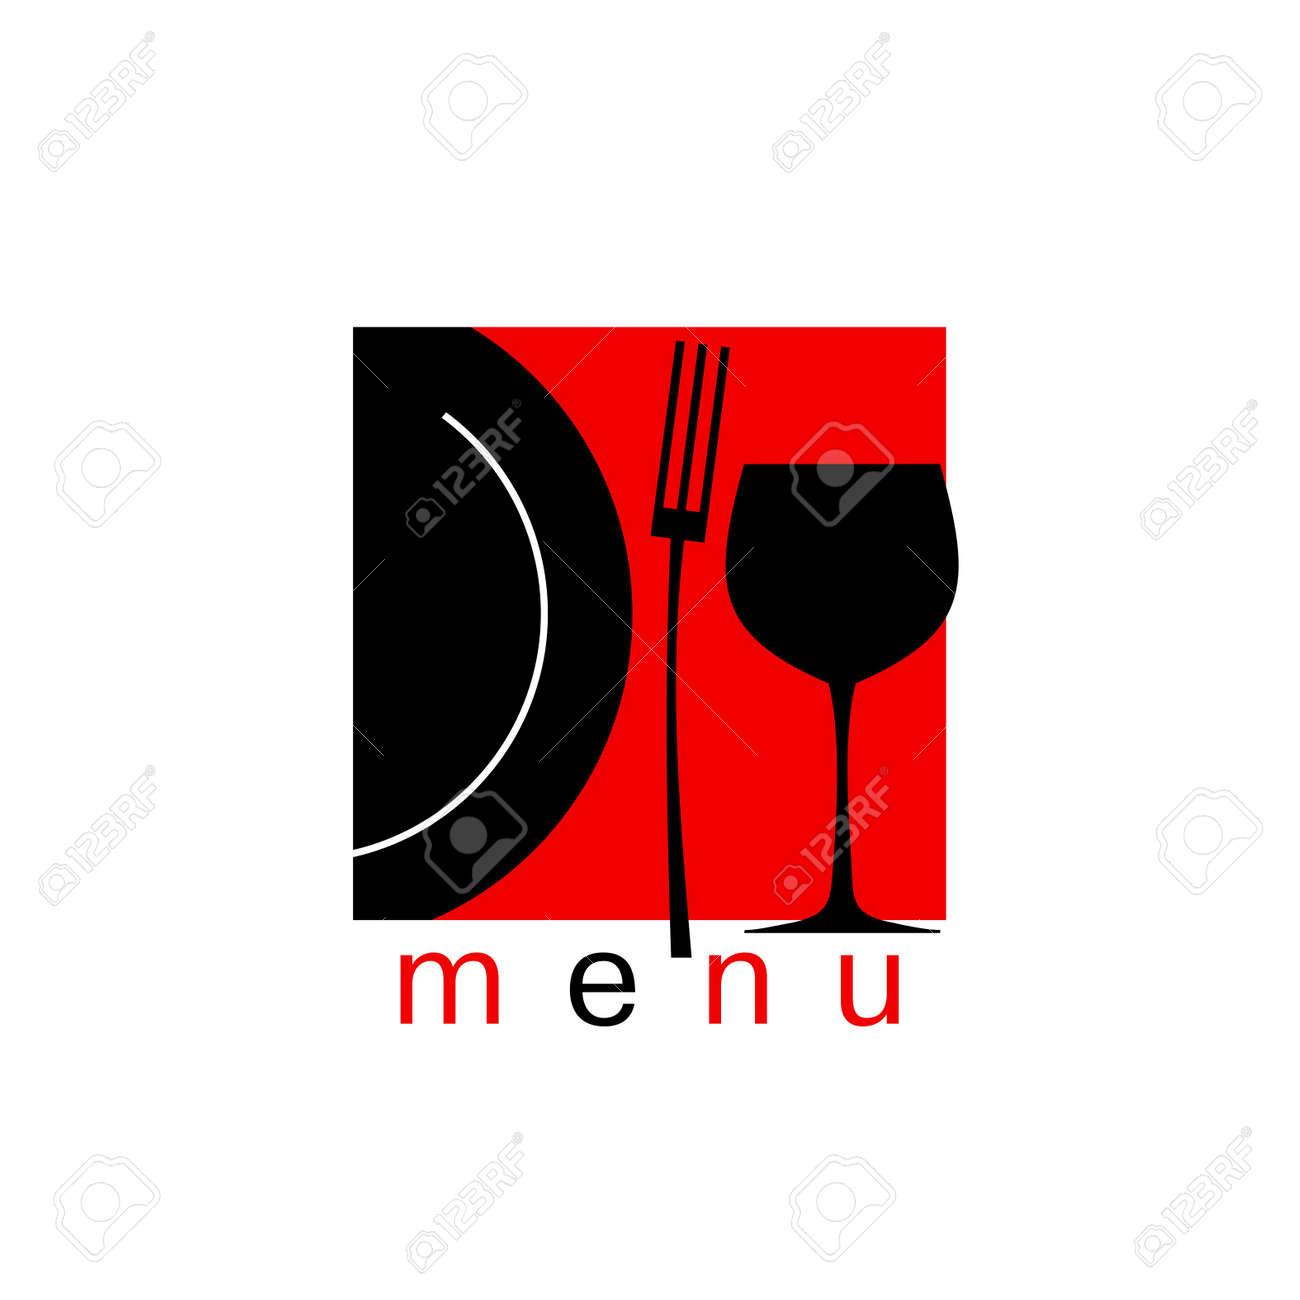 Stylish Restaurant Menu Card Design template. Stock Vector - 16917160